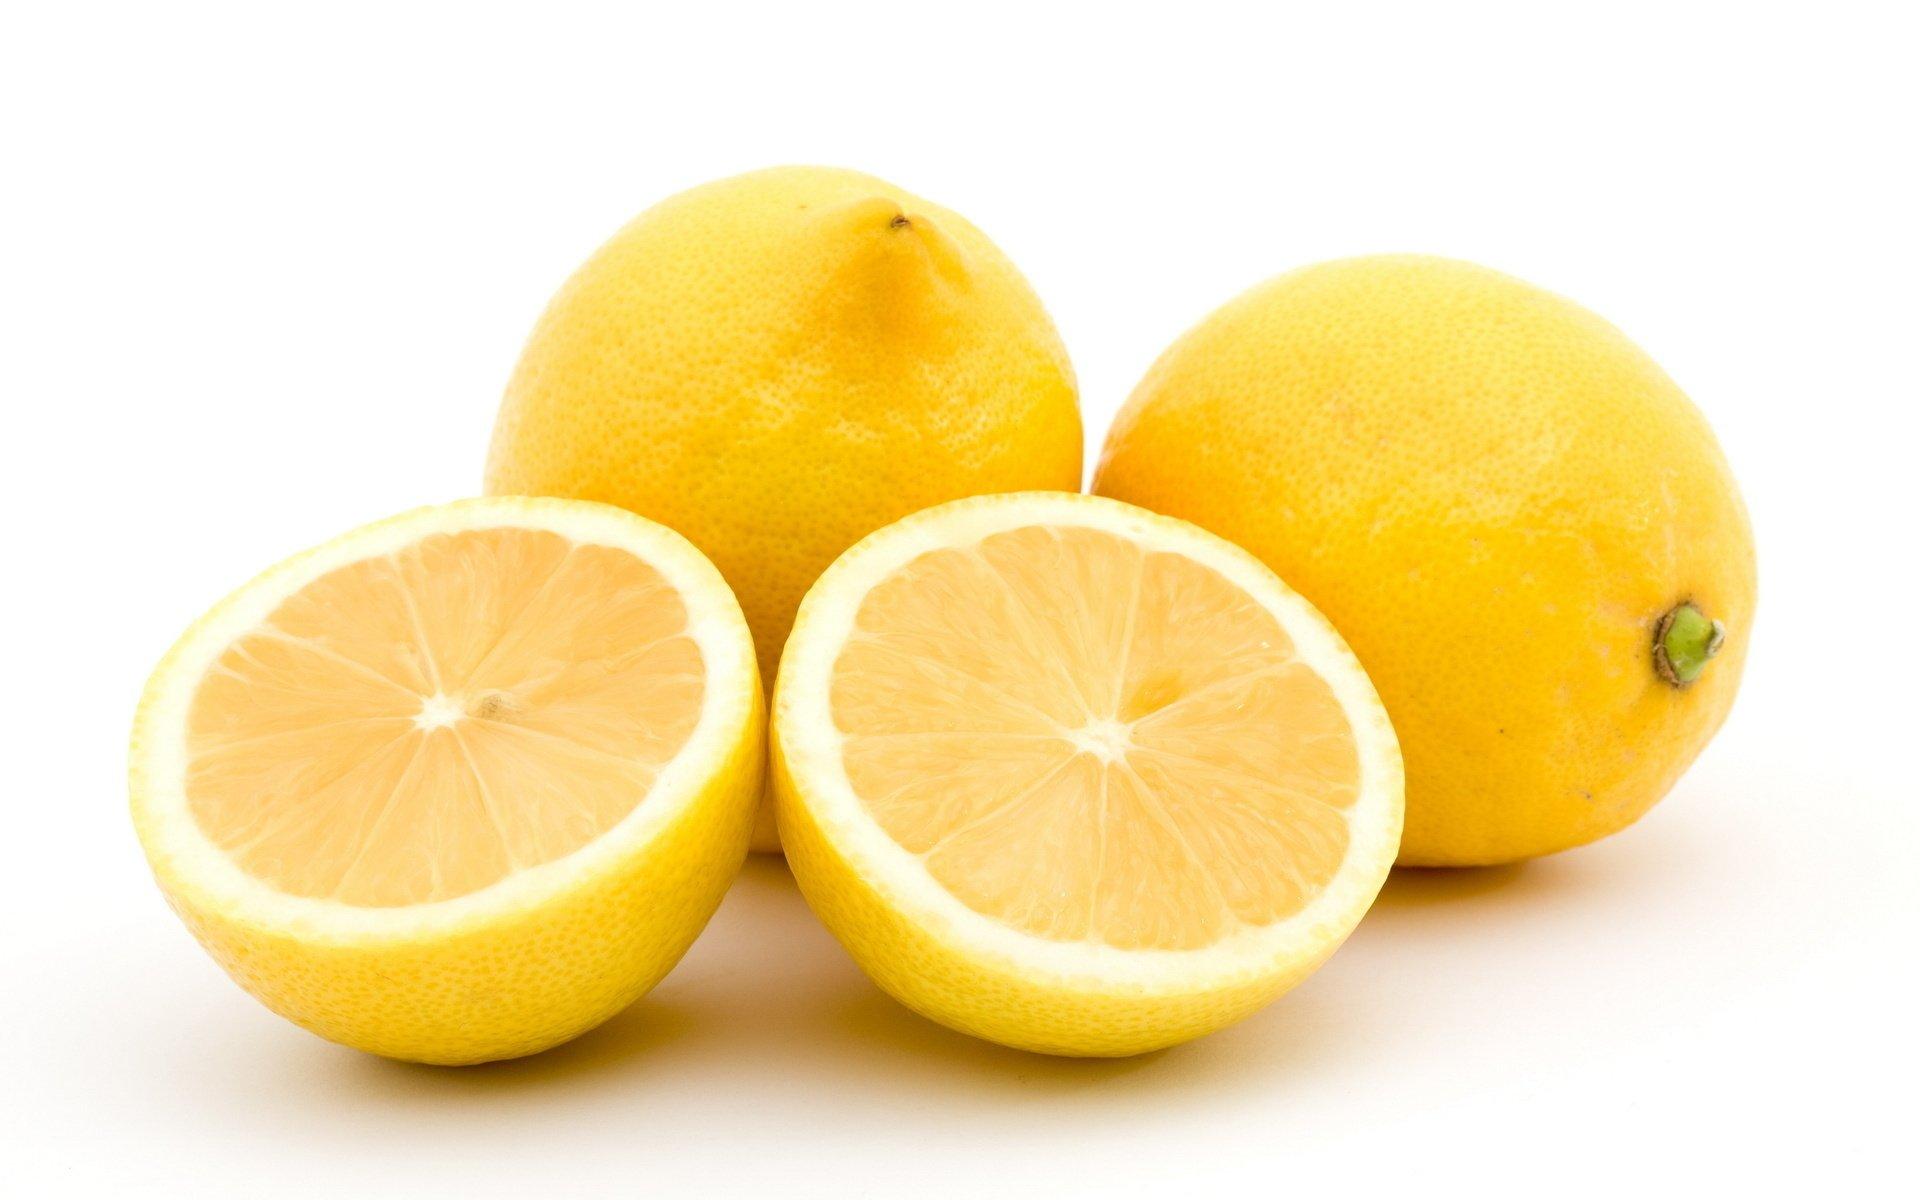 Lemon Hd Wallpaper Background Image 1920x1200 Id